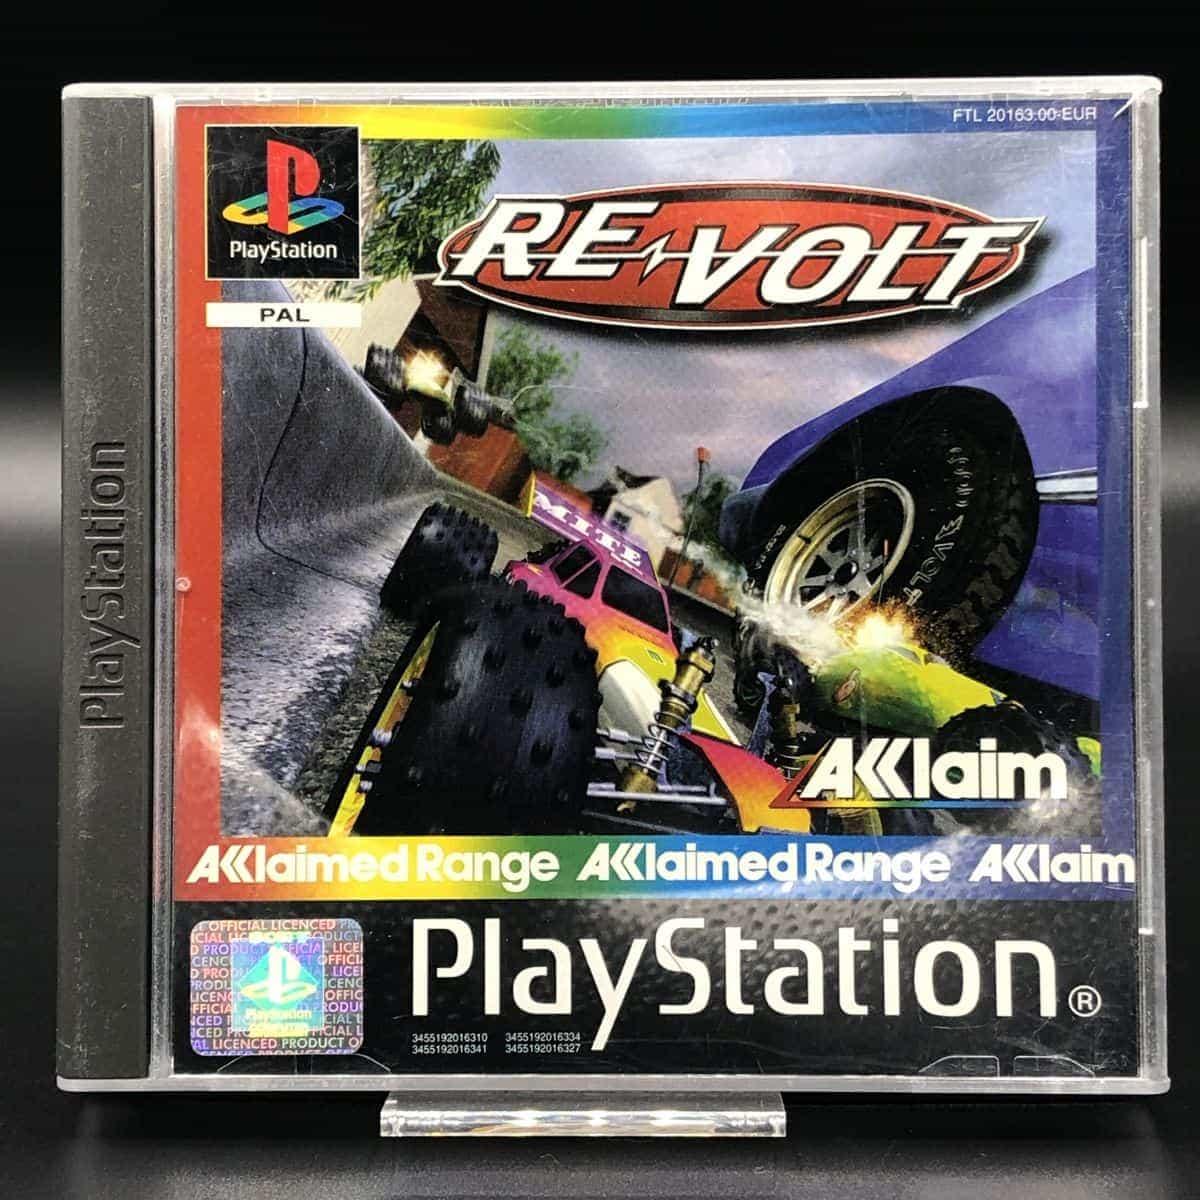 PS1 Re-Volt (Acclaim Range) (Komplett) (Sehr gut) Sony PlayStation 1